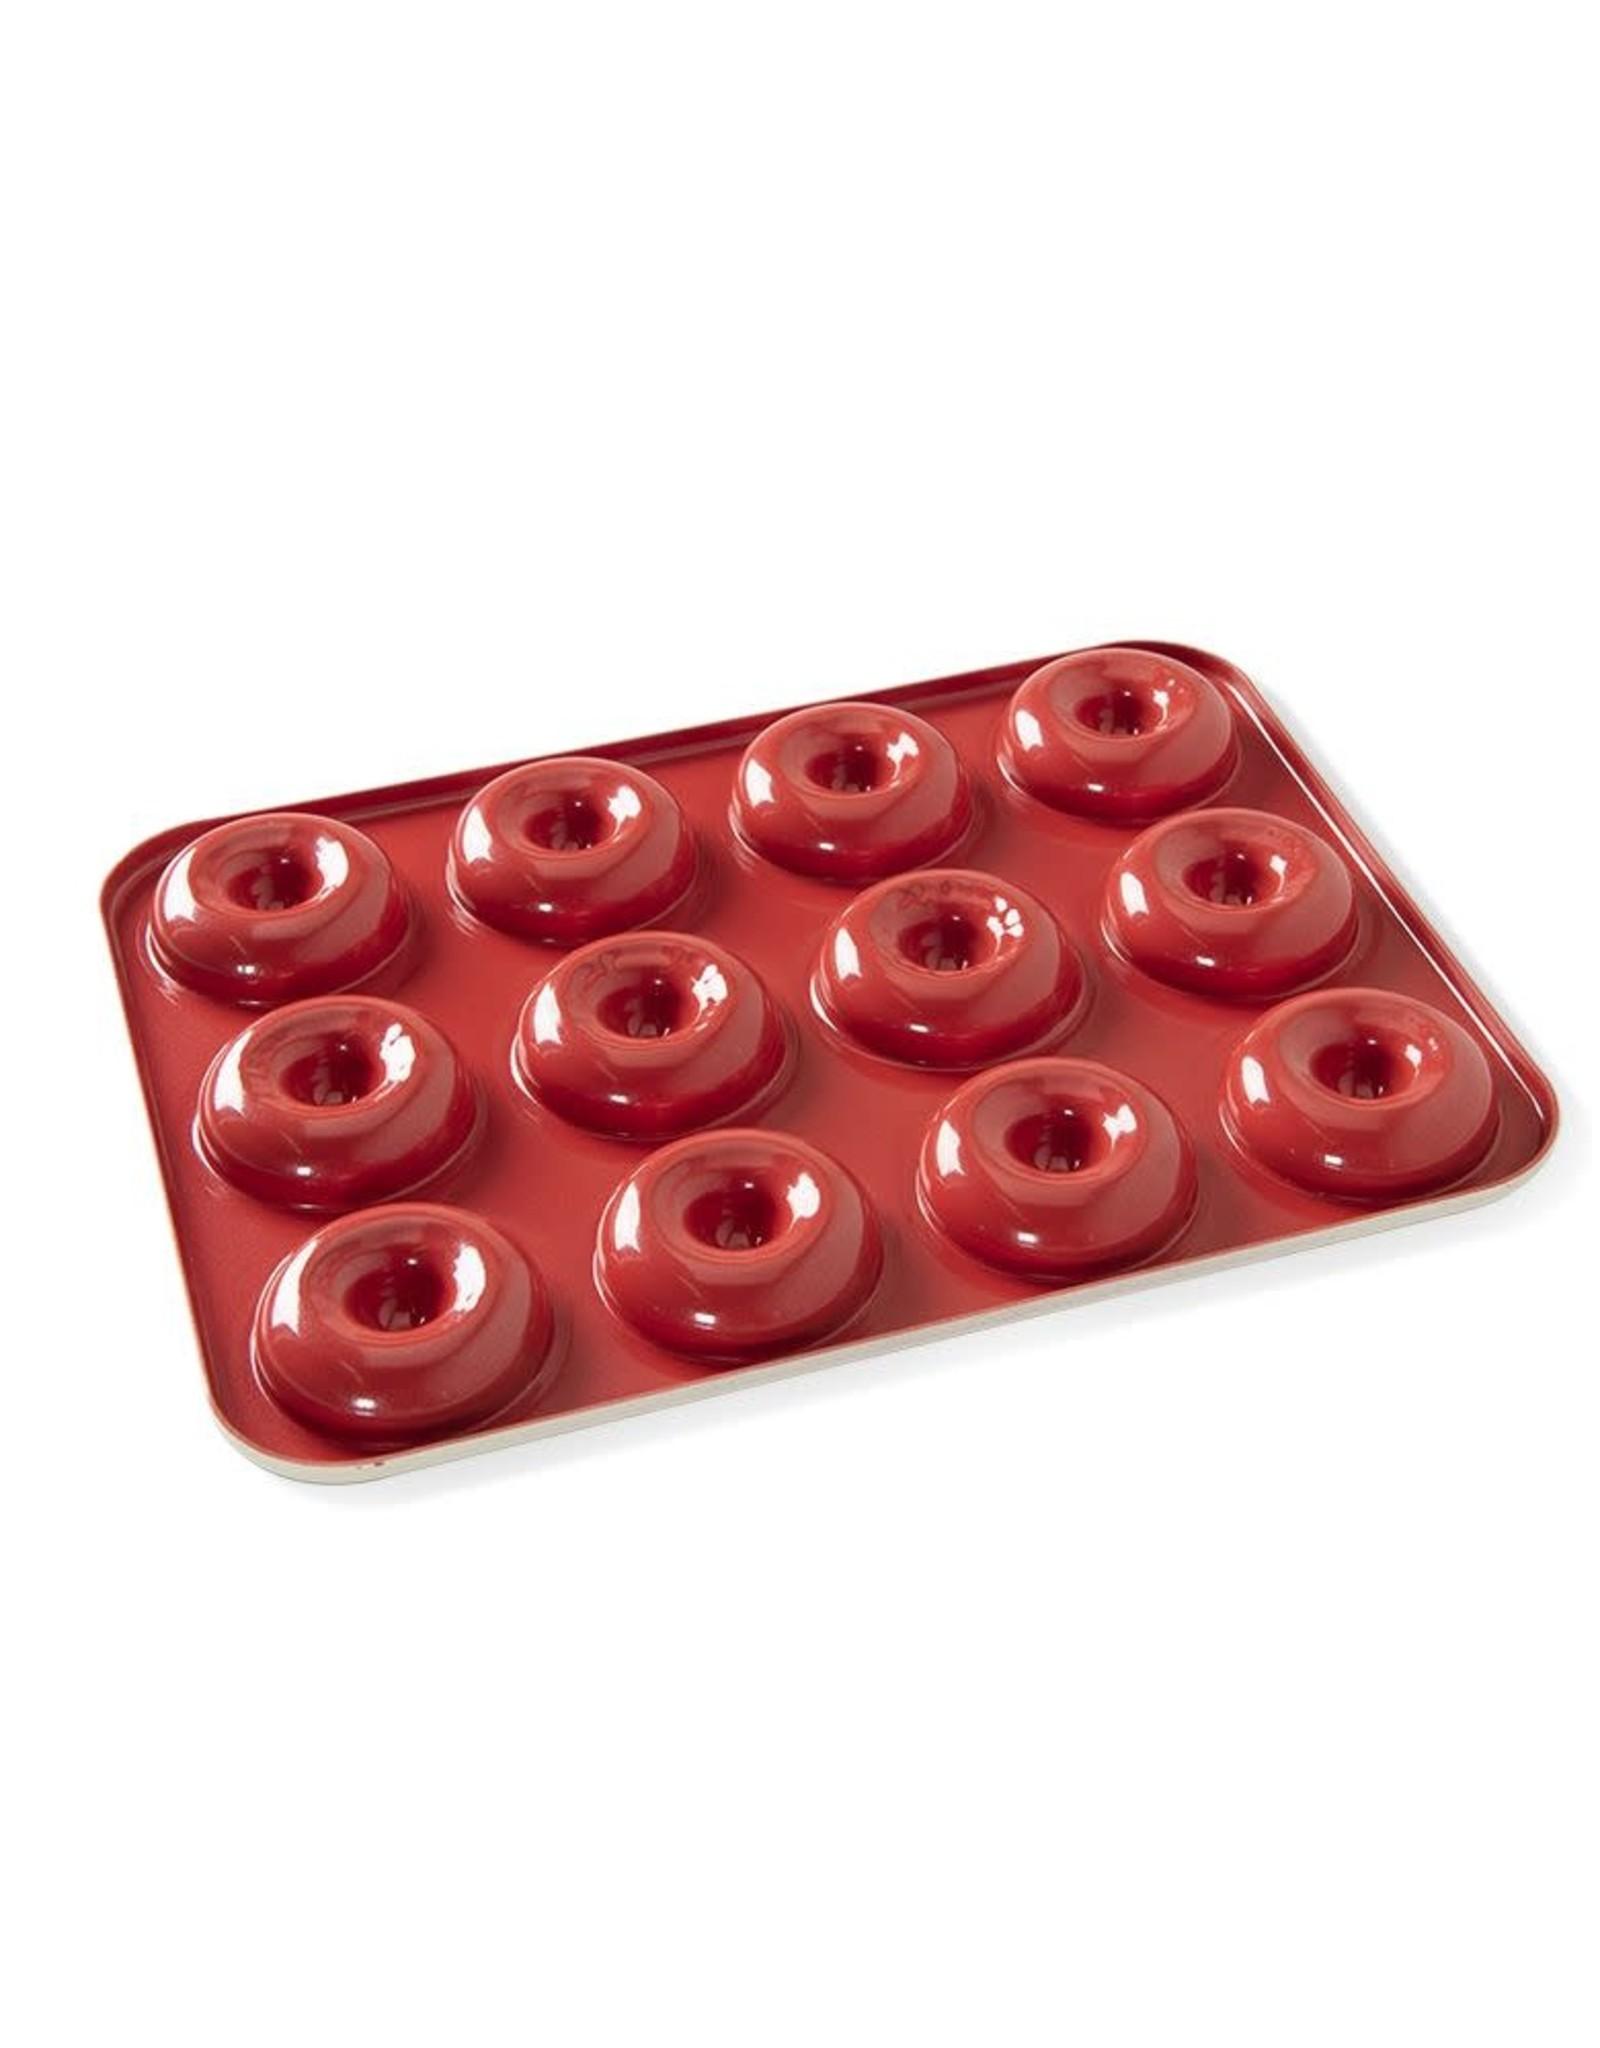 Nordic Ware Mini Donut Pan, Cream/Red, 12 Ct.